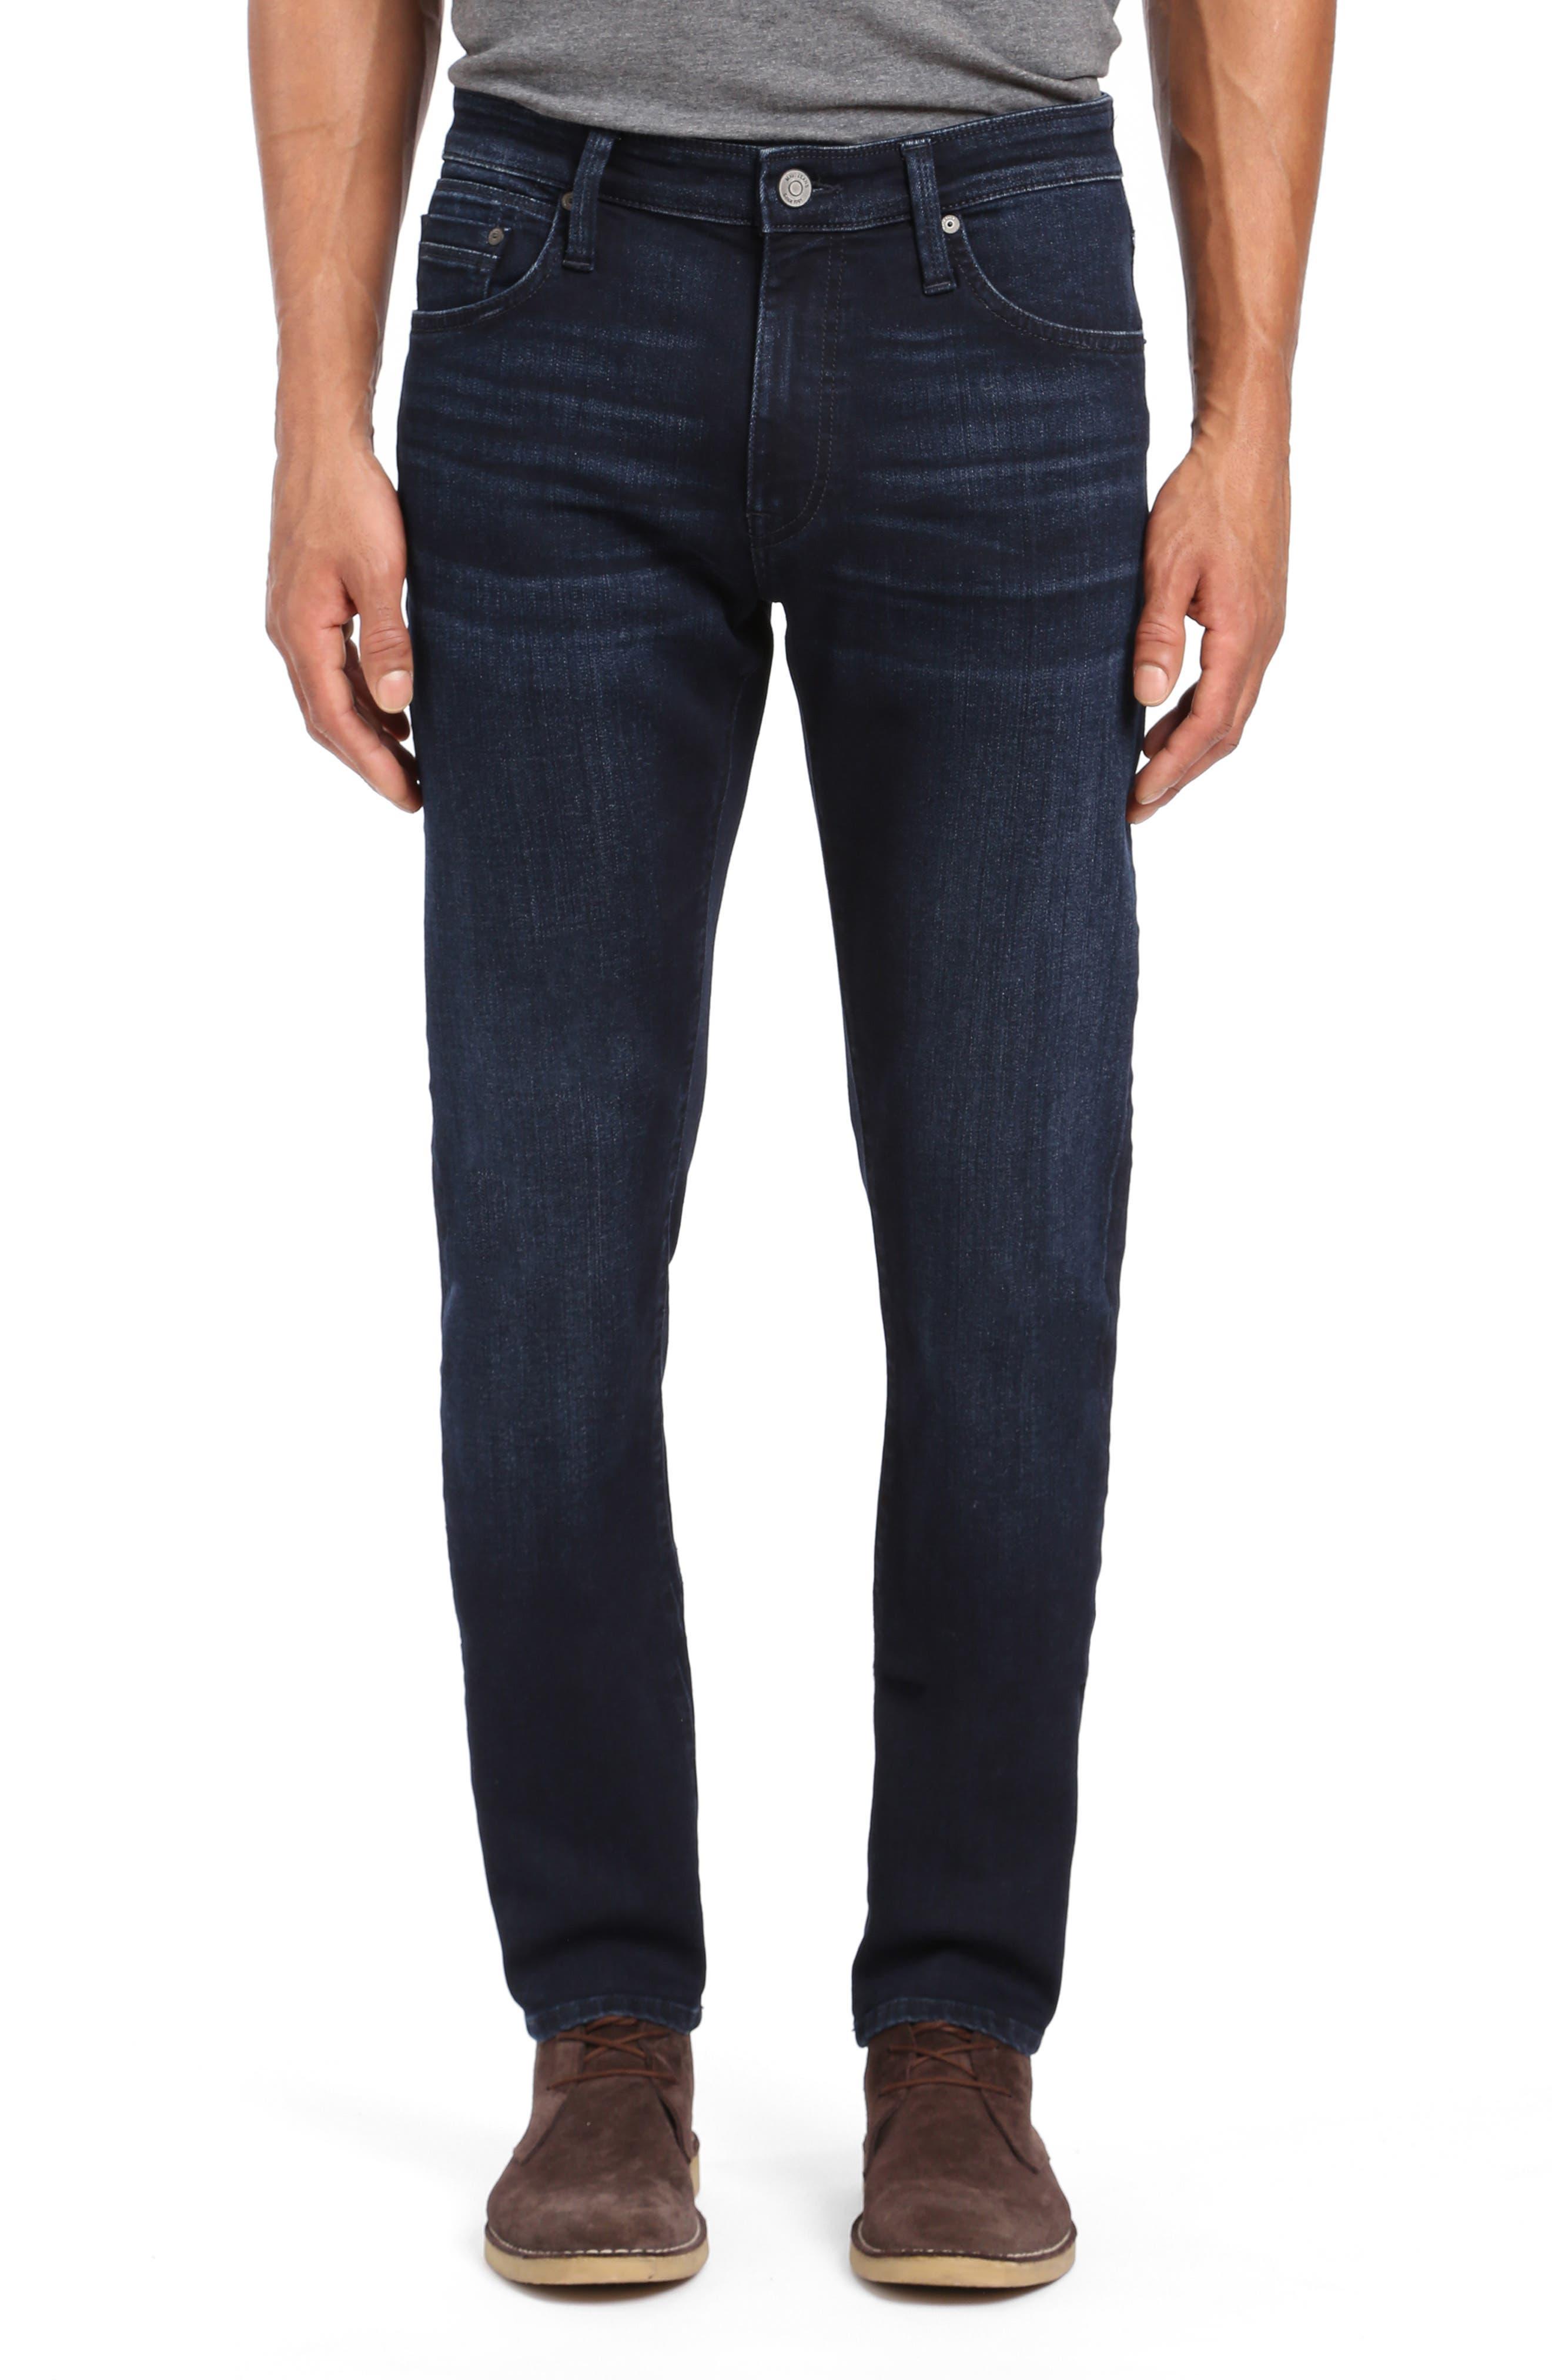 Jake Skinny Fit Jeans,                             Main thumbnail 1, color,                             INK FOGGY WILLIAMSBURG